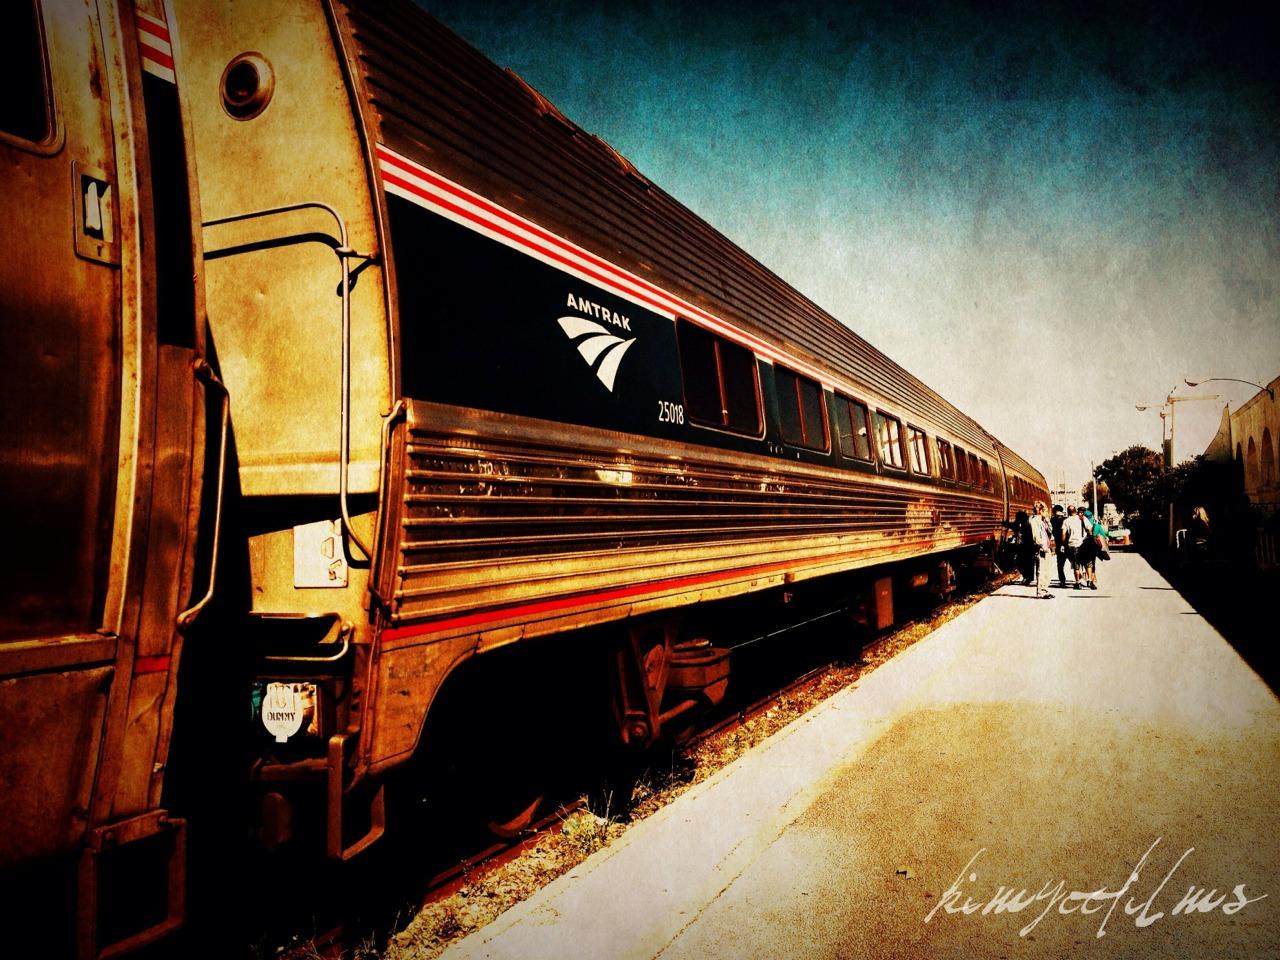 De train! De train!